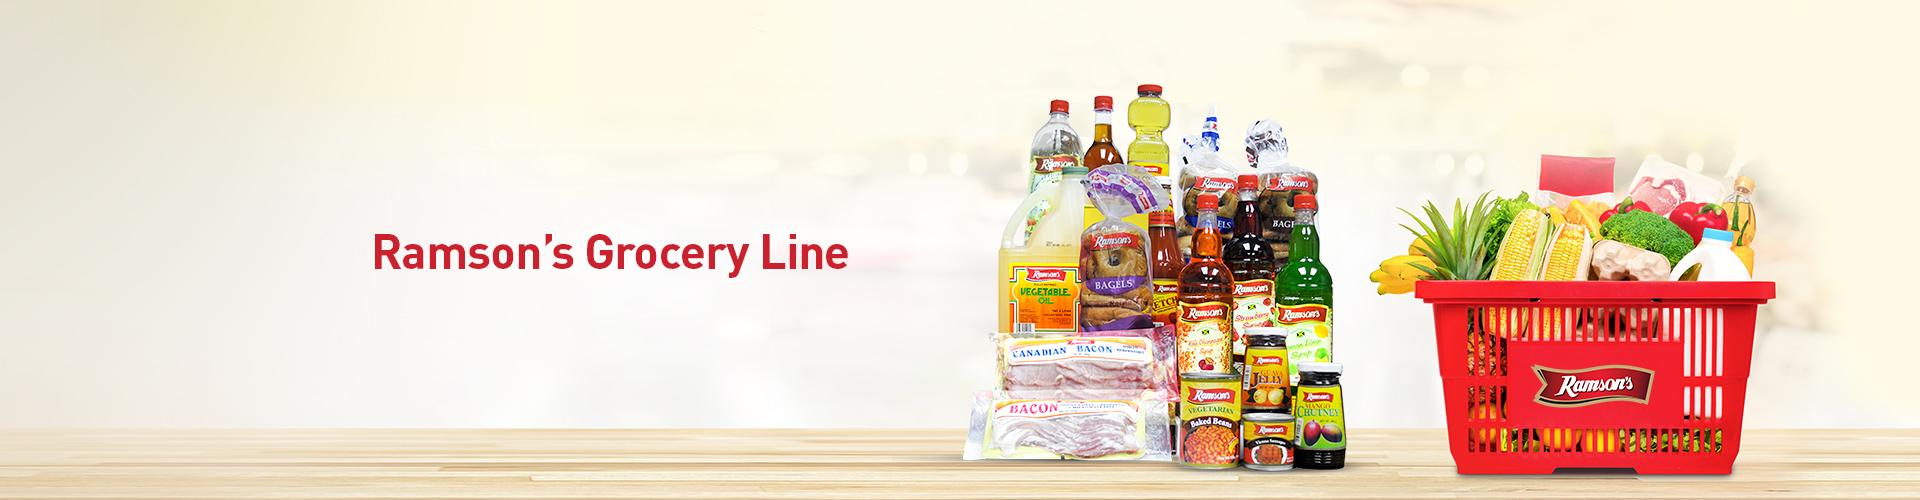 Ramson's Grocery Line